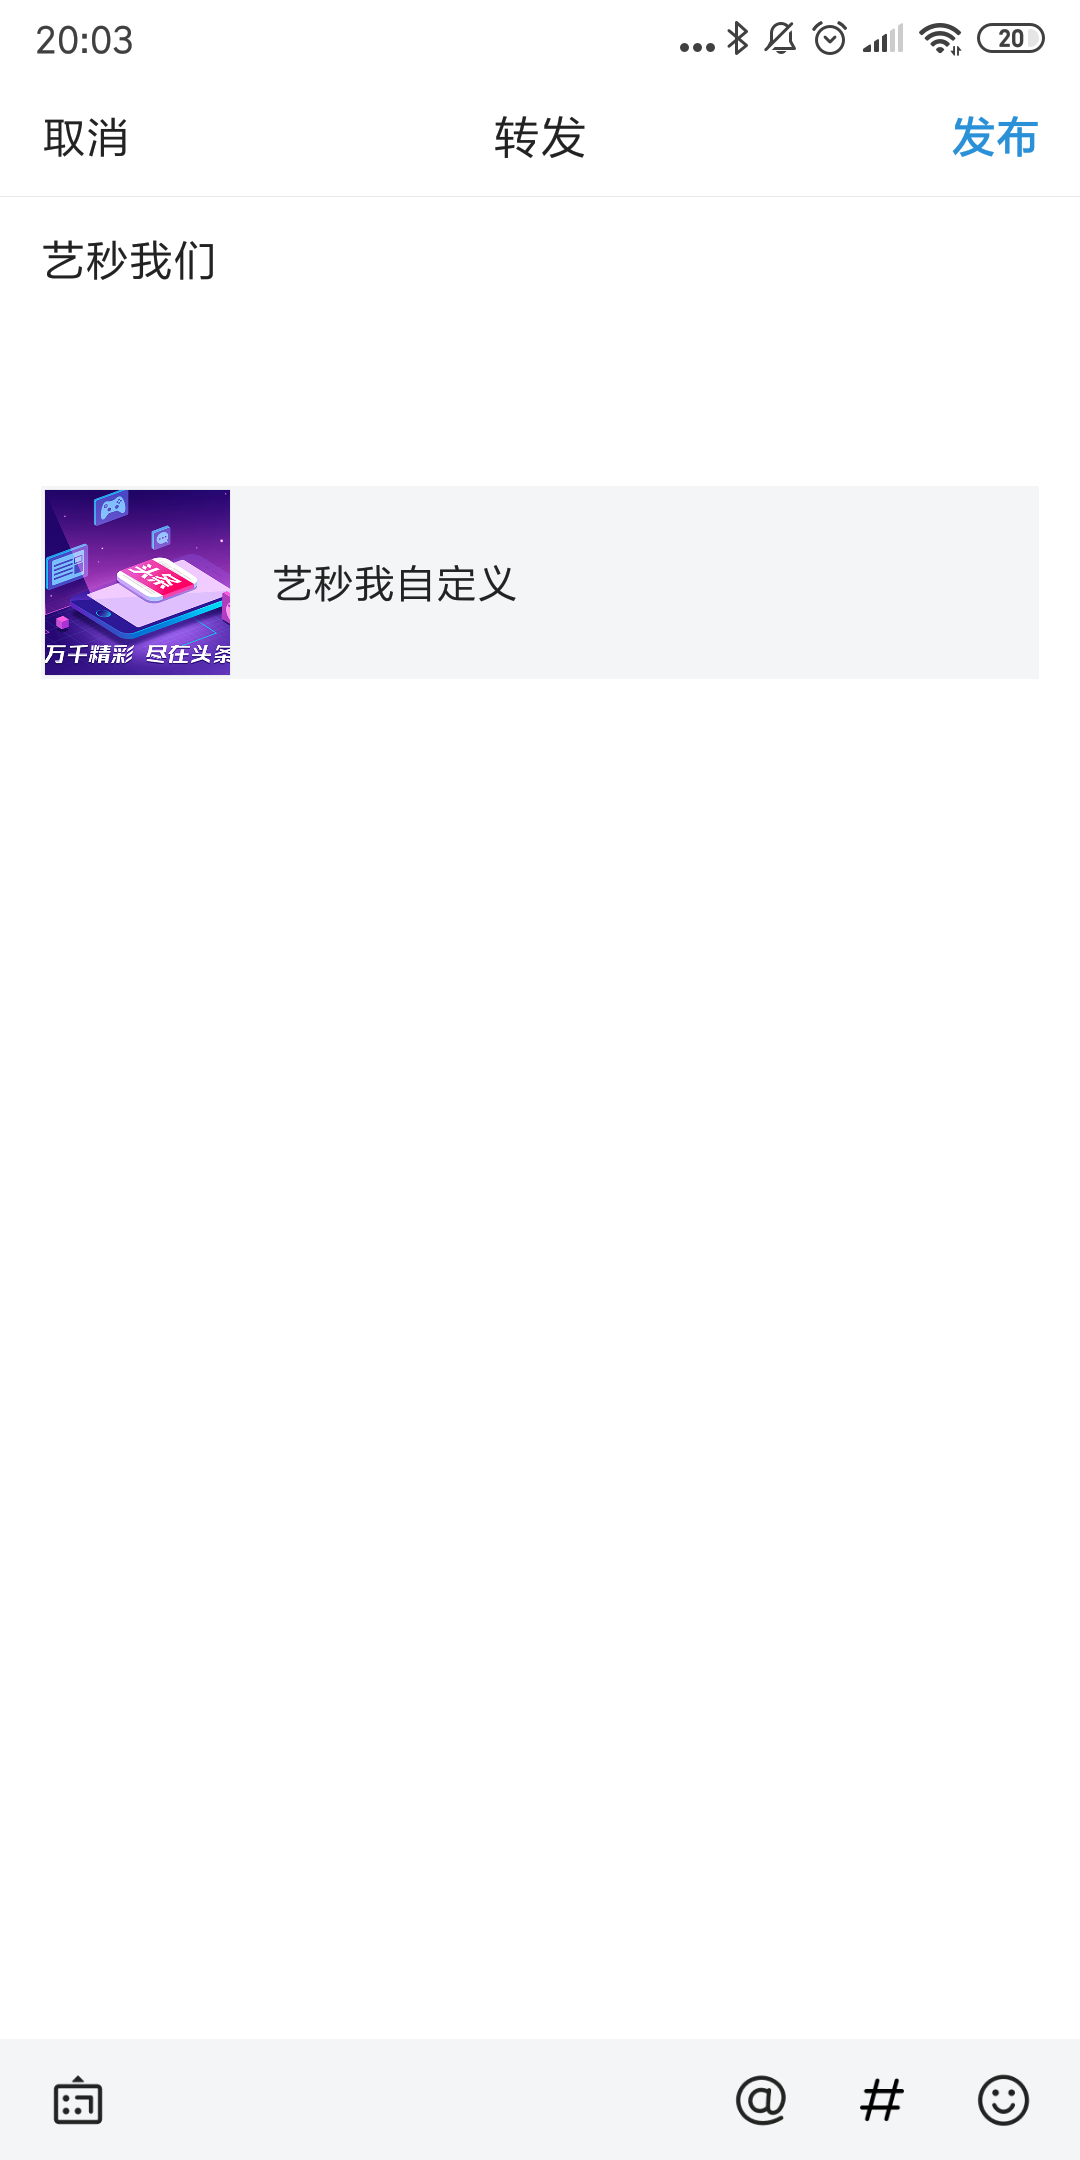 Screenshot_2020-02-08-20-03-43-355_com.ss.android.png